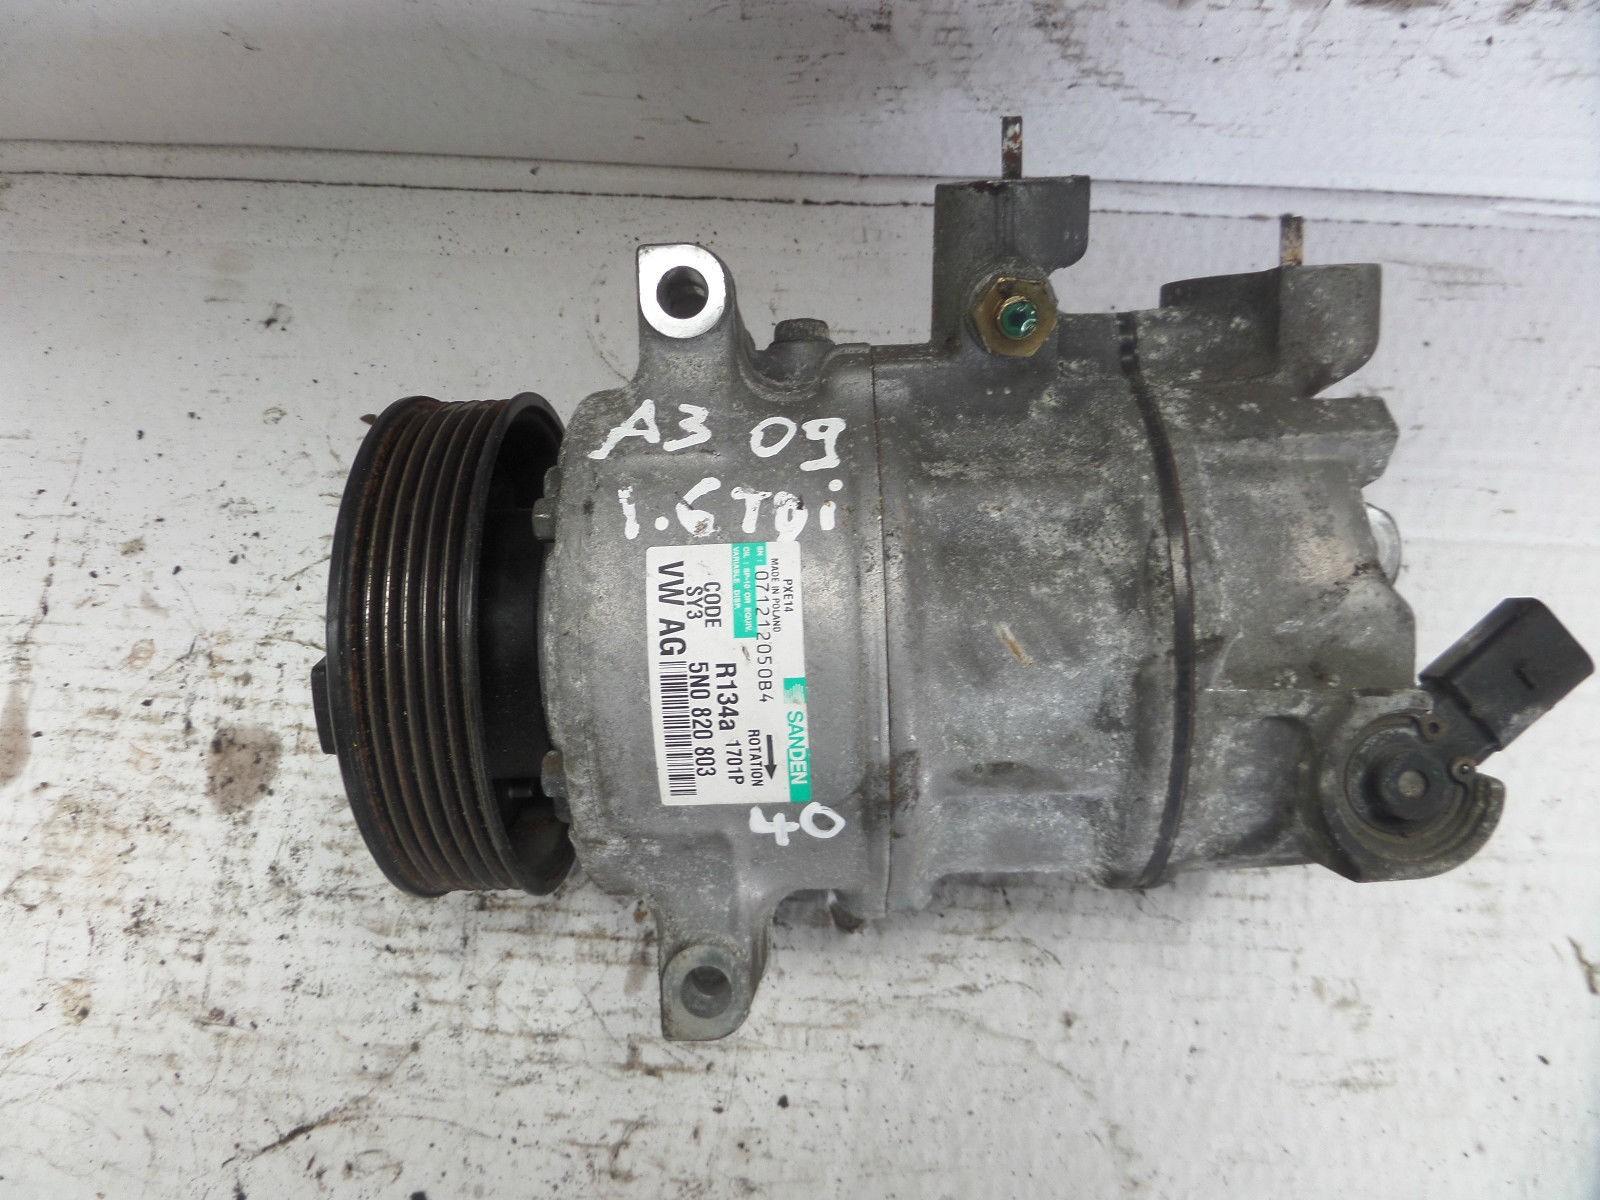 Compressor Of Air Conditioning Audi Seat Vw Kompressor Golf Valeo Skoda Ref 5n0820803 5n0820803a 5n0820803c 5n0820803e Sale Auto Spare Part On